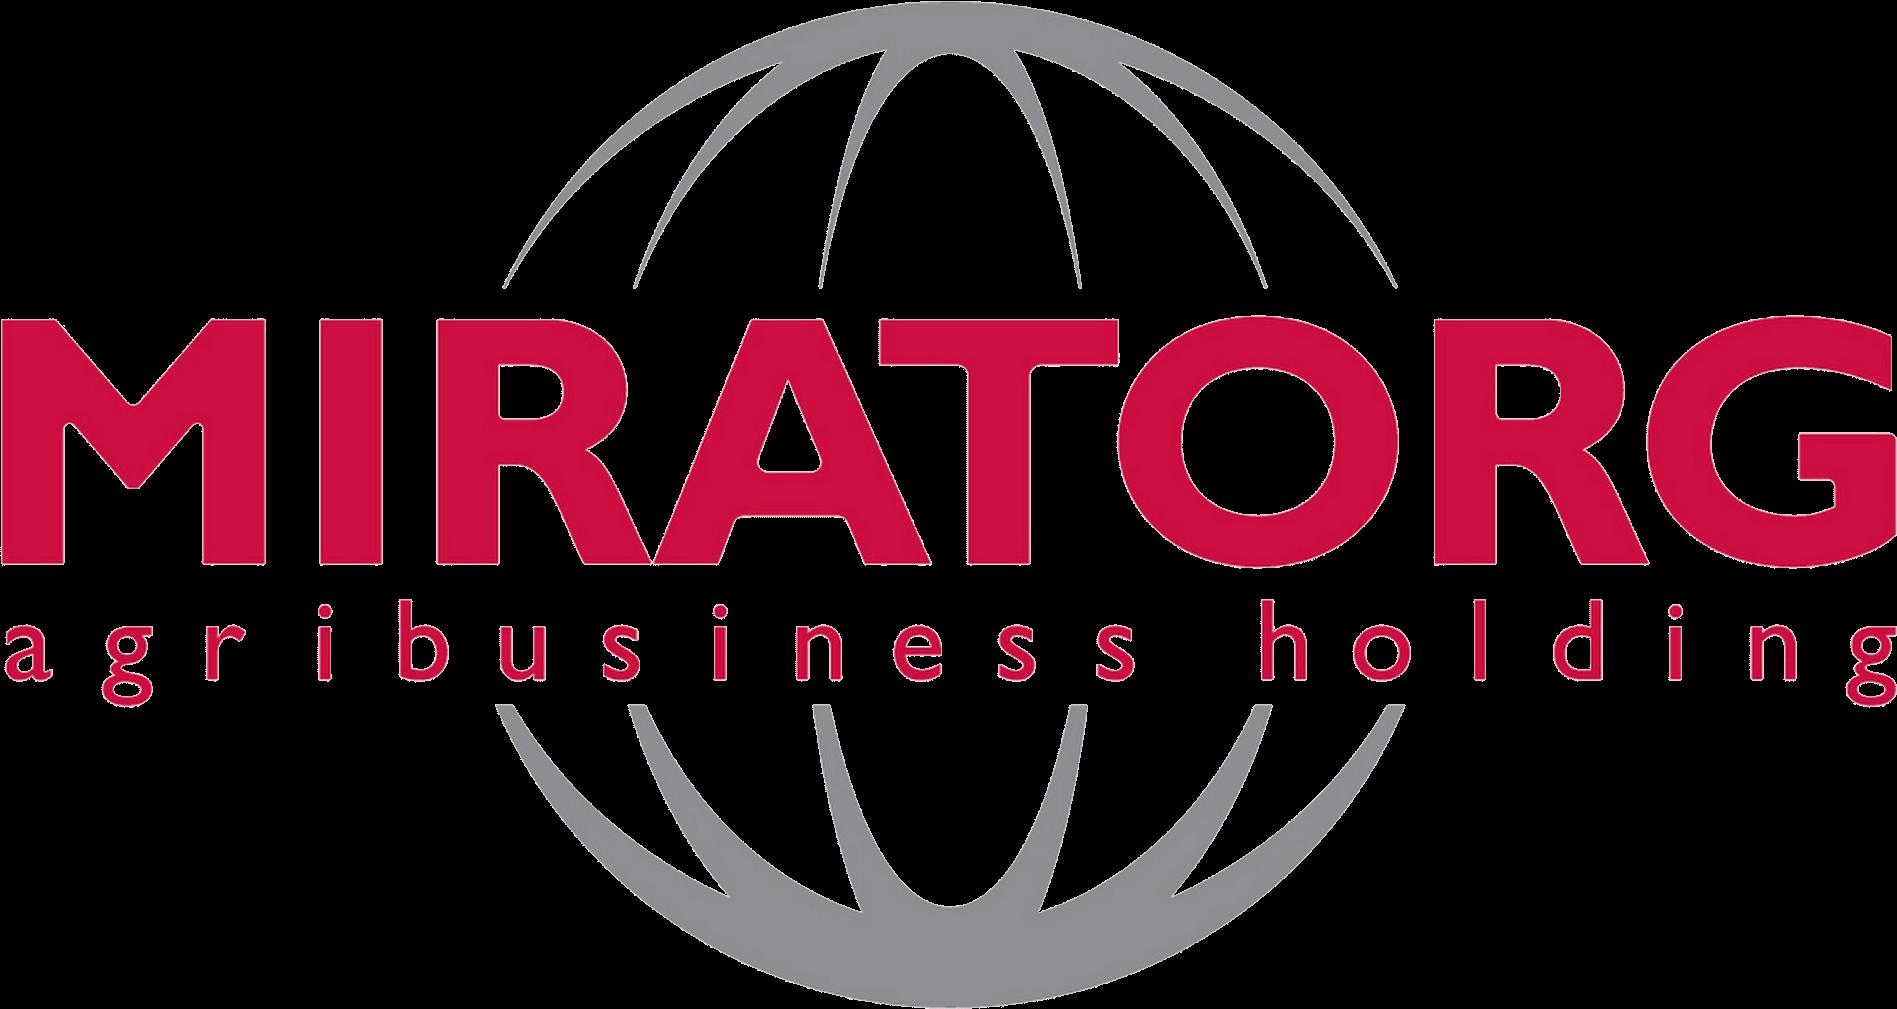 850-8506444_russian-rodeo-miratorg-miratorg-logo-png